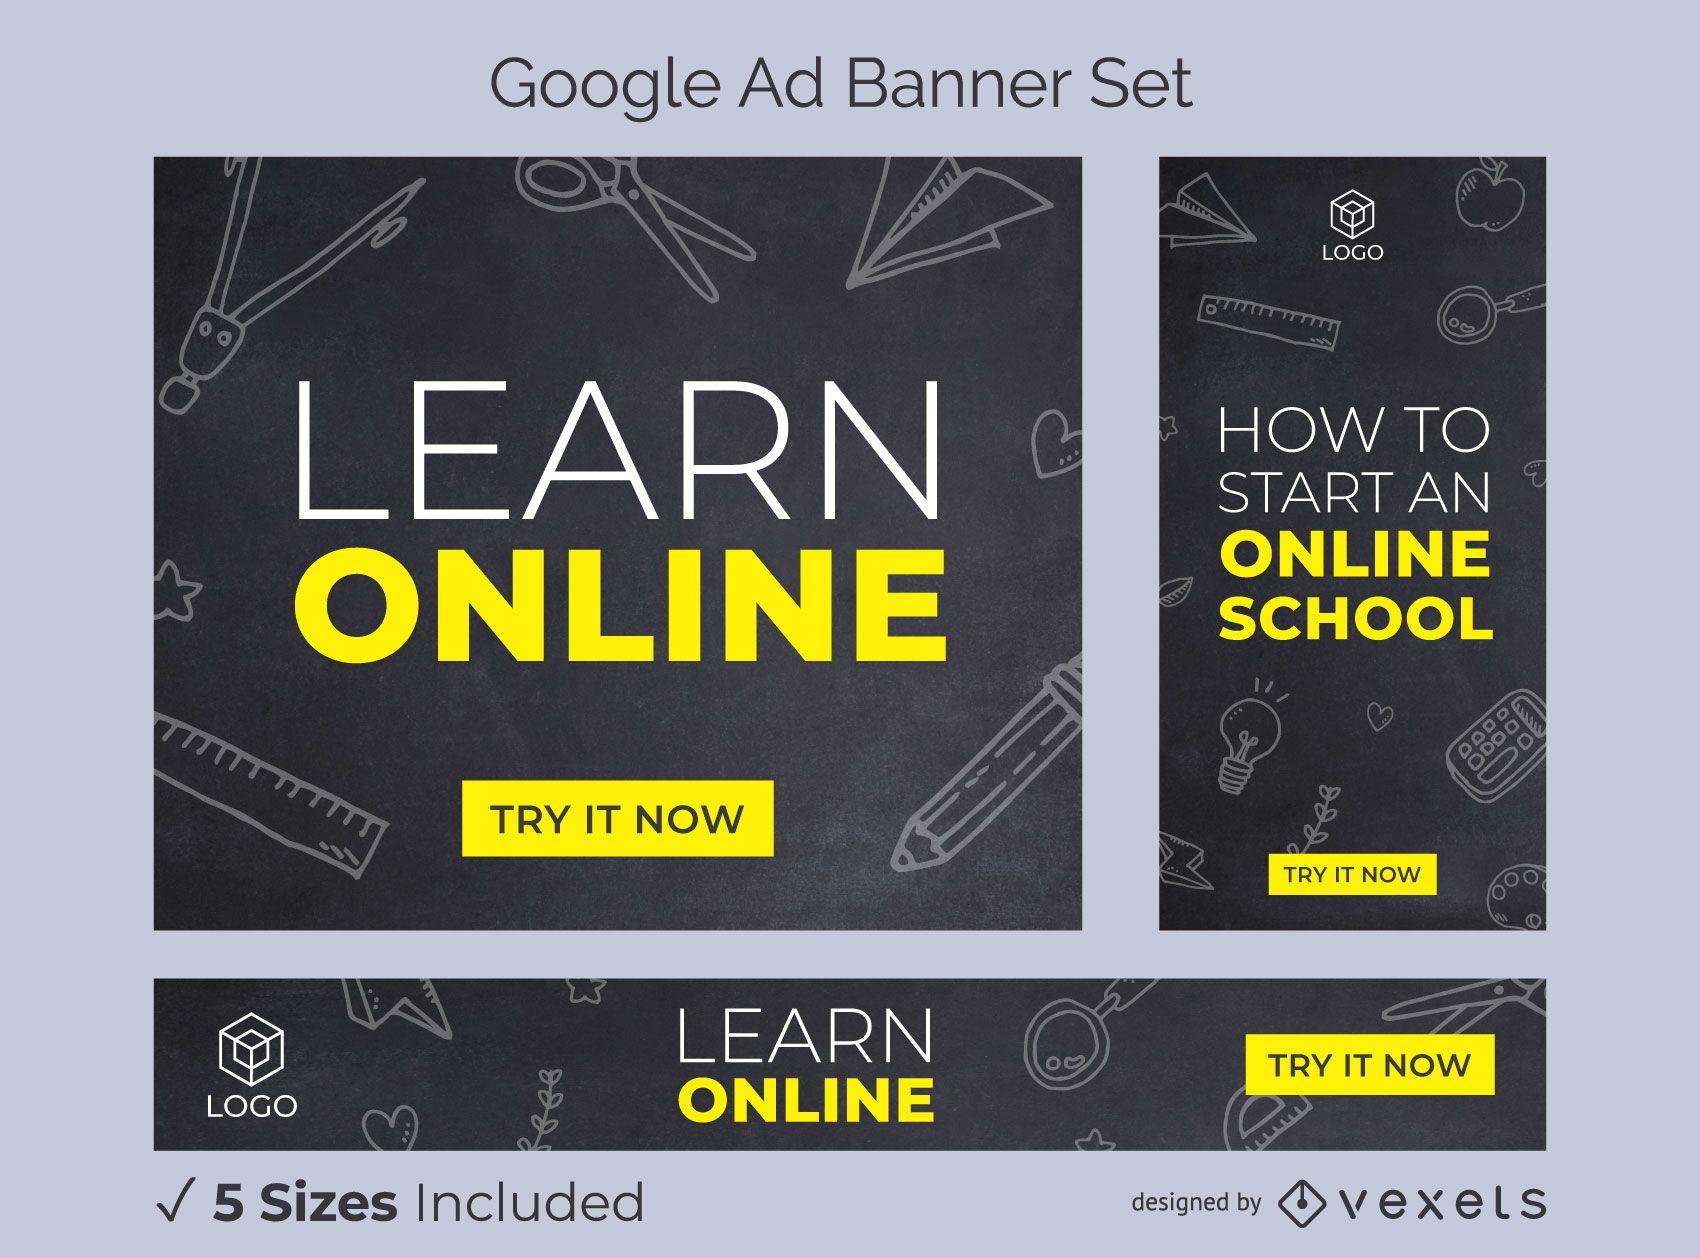 Aprenda online o conjunto de banners de anúncios escolares